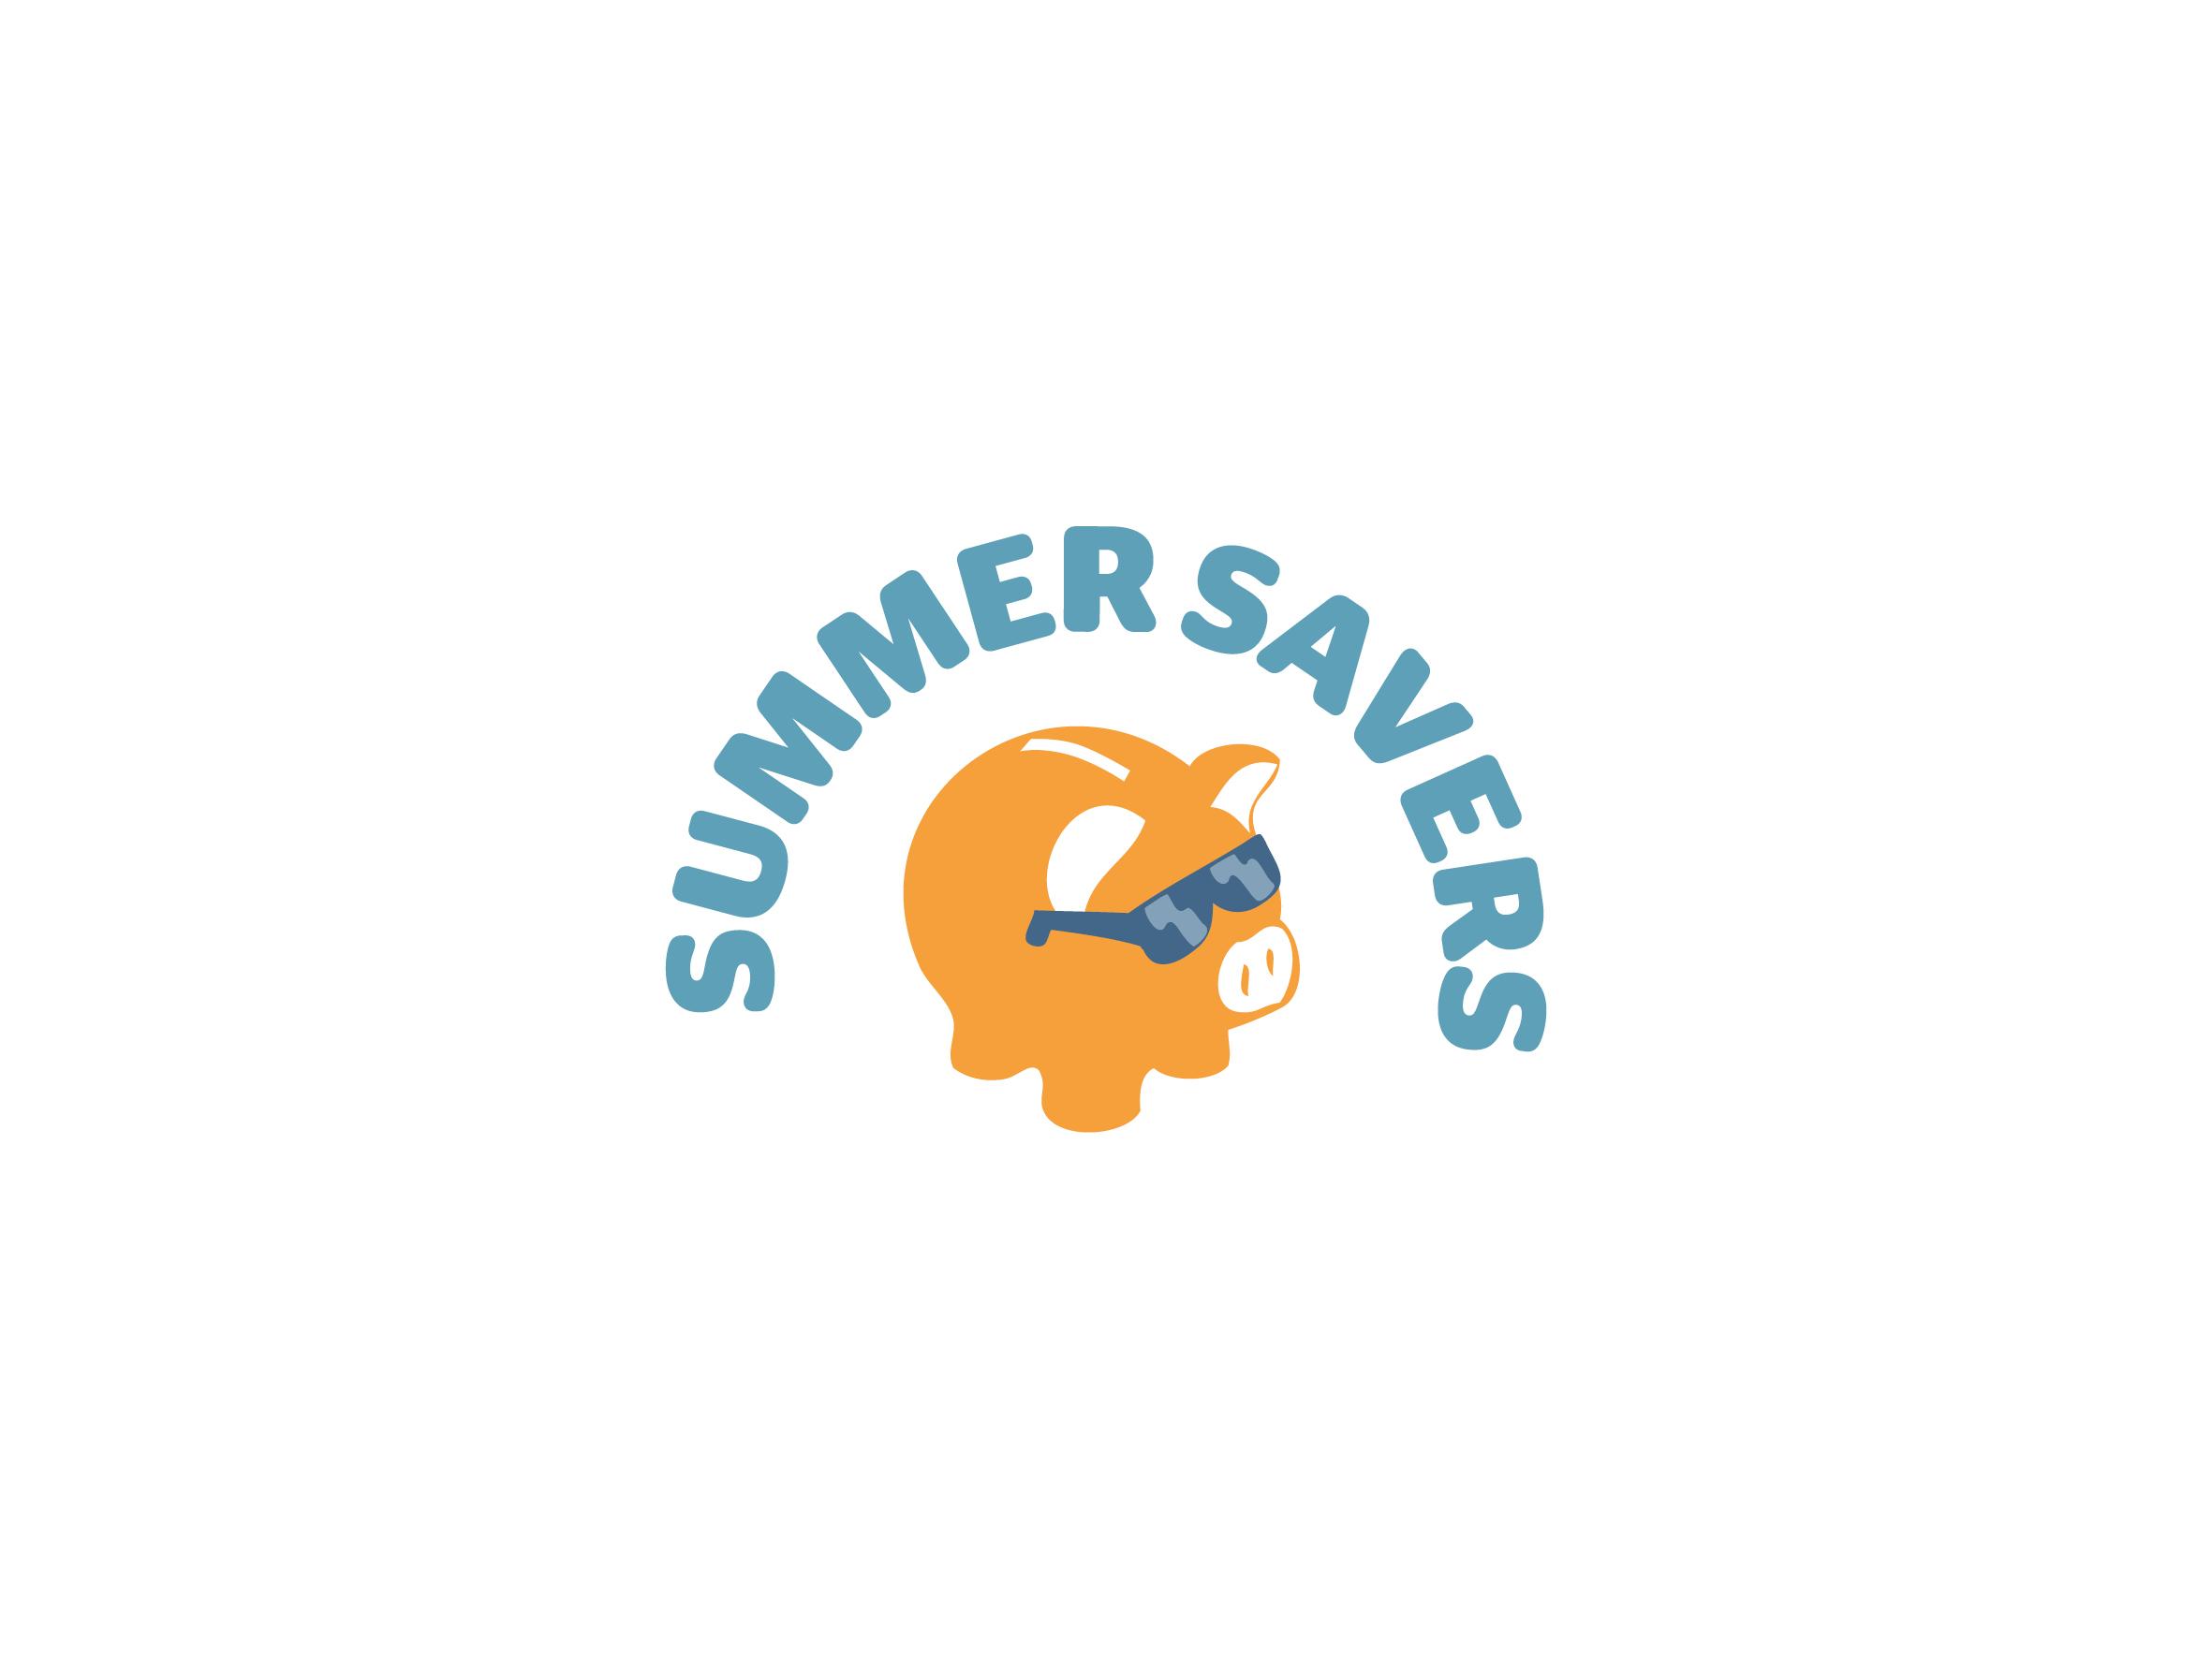 summer savers logo design designed by Dakini Design Saltaire, Shipley, Bradford